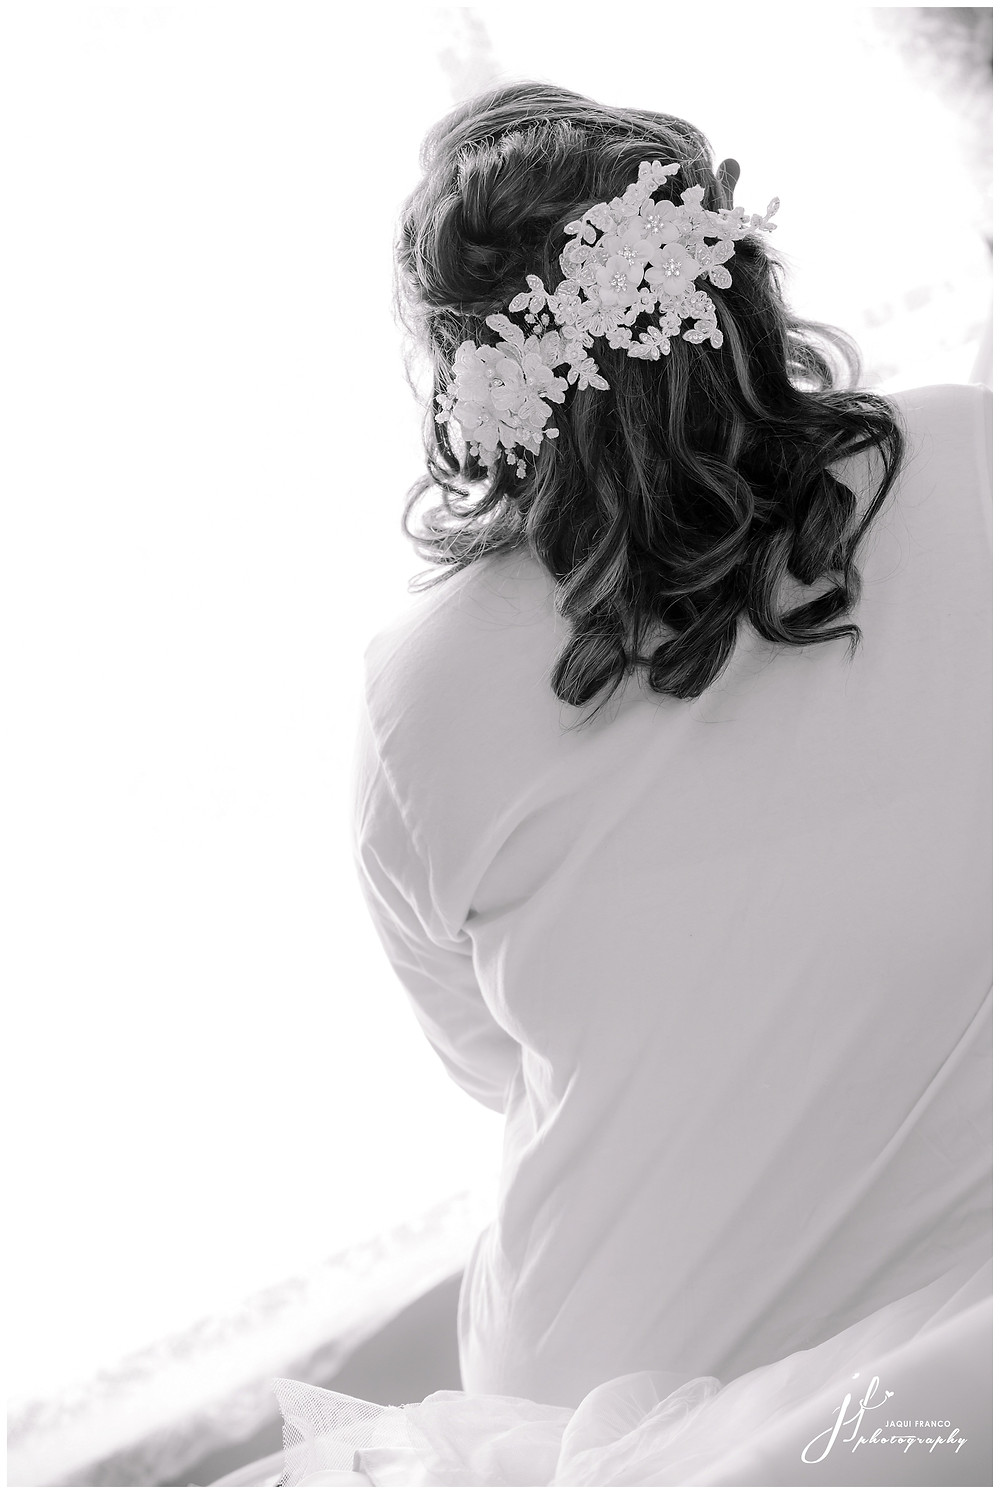 Bridap Portraits by Jaqui Franco Photography